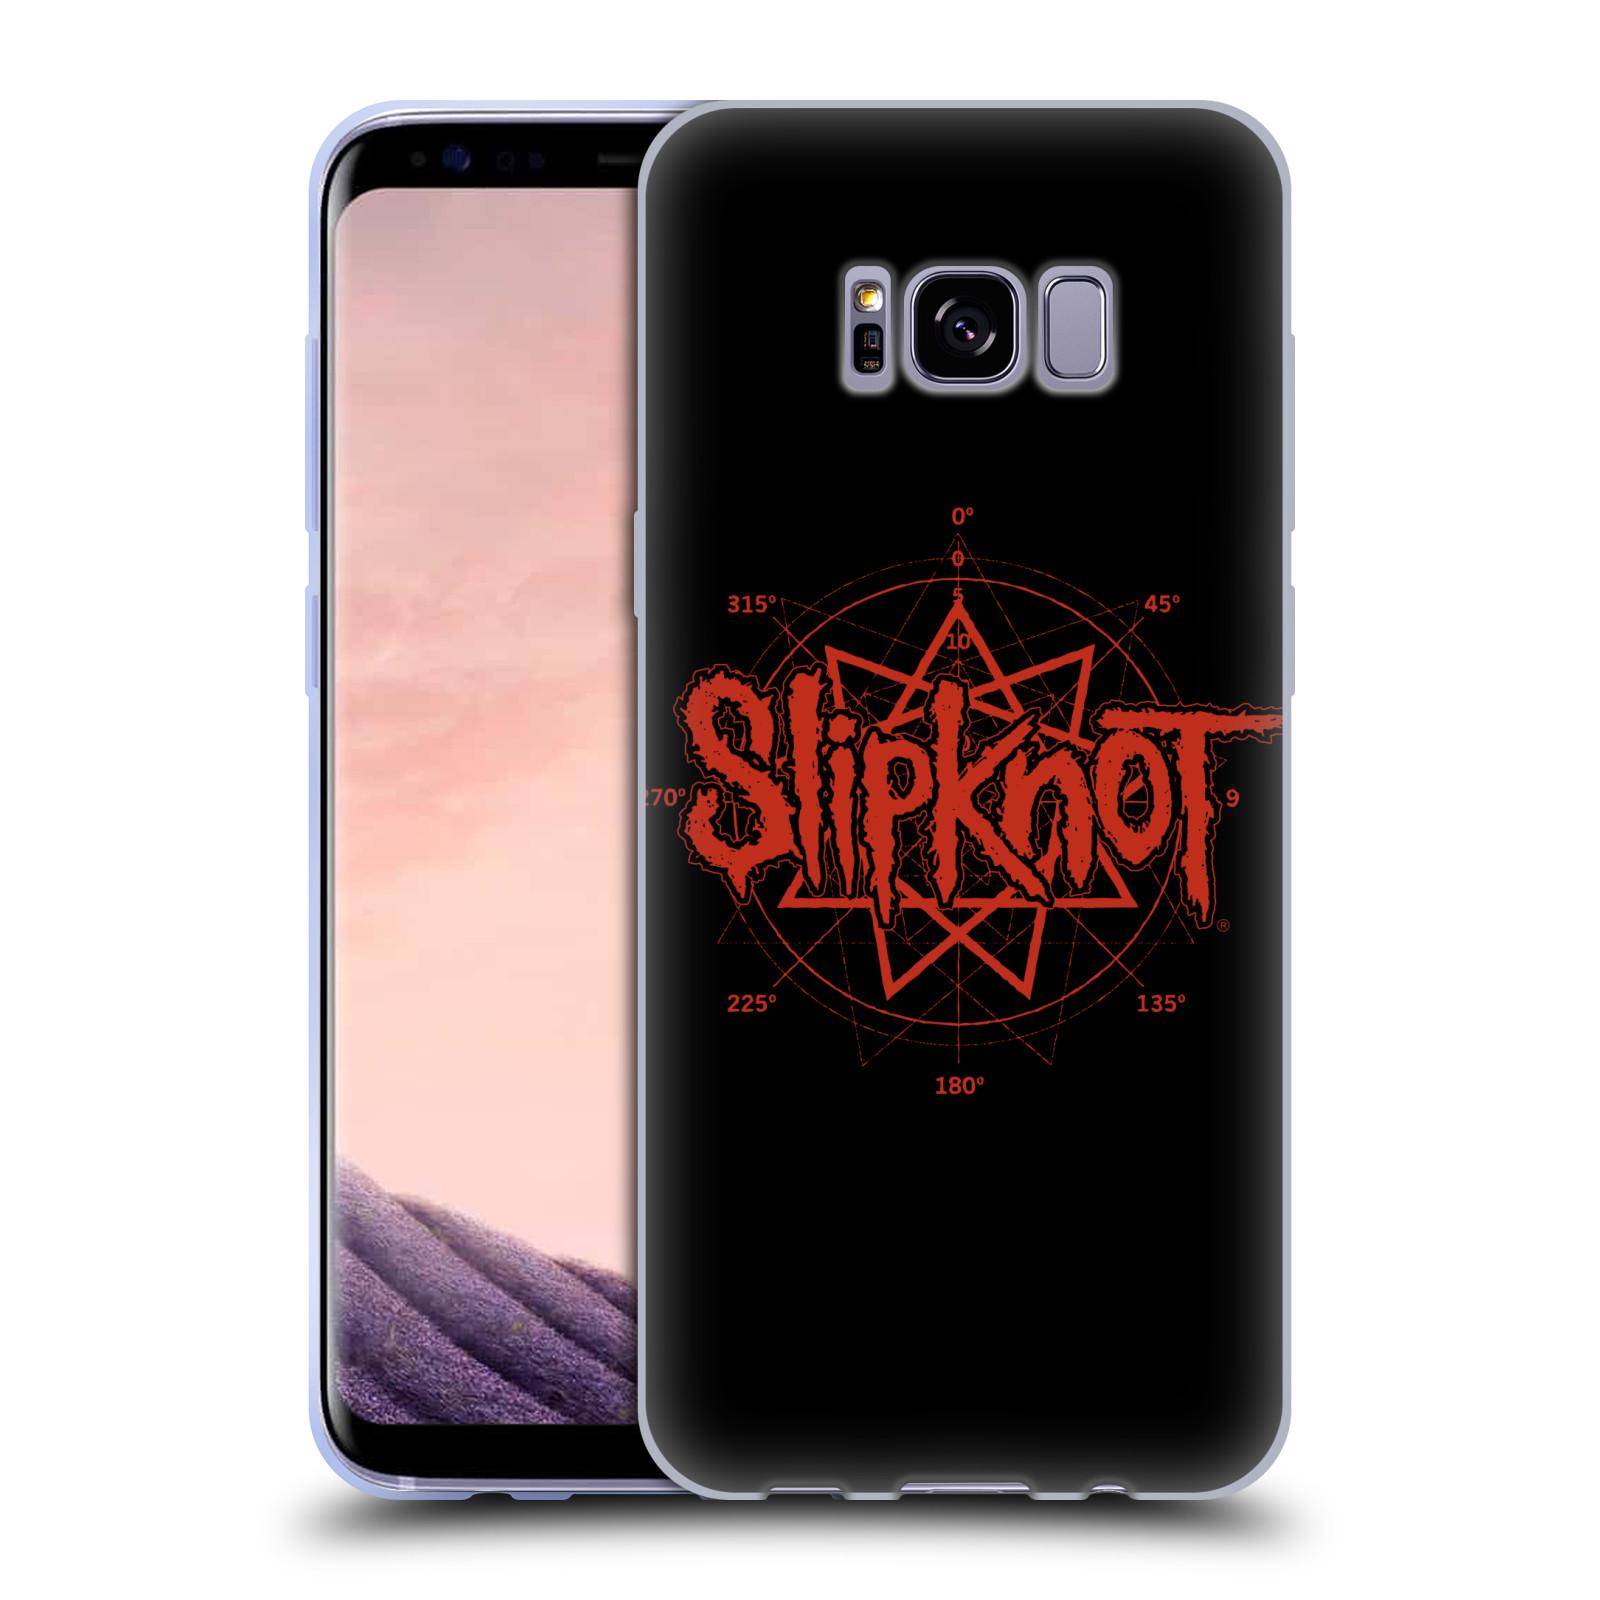 HEAD CASE silikonový obal na mobil Samsung Galaxy S8 PLUS hudební skupina Slipknot logo